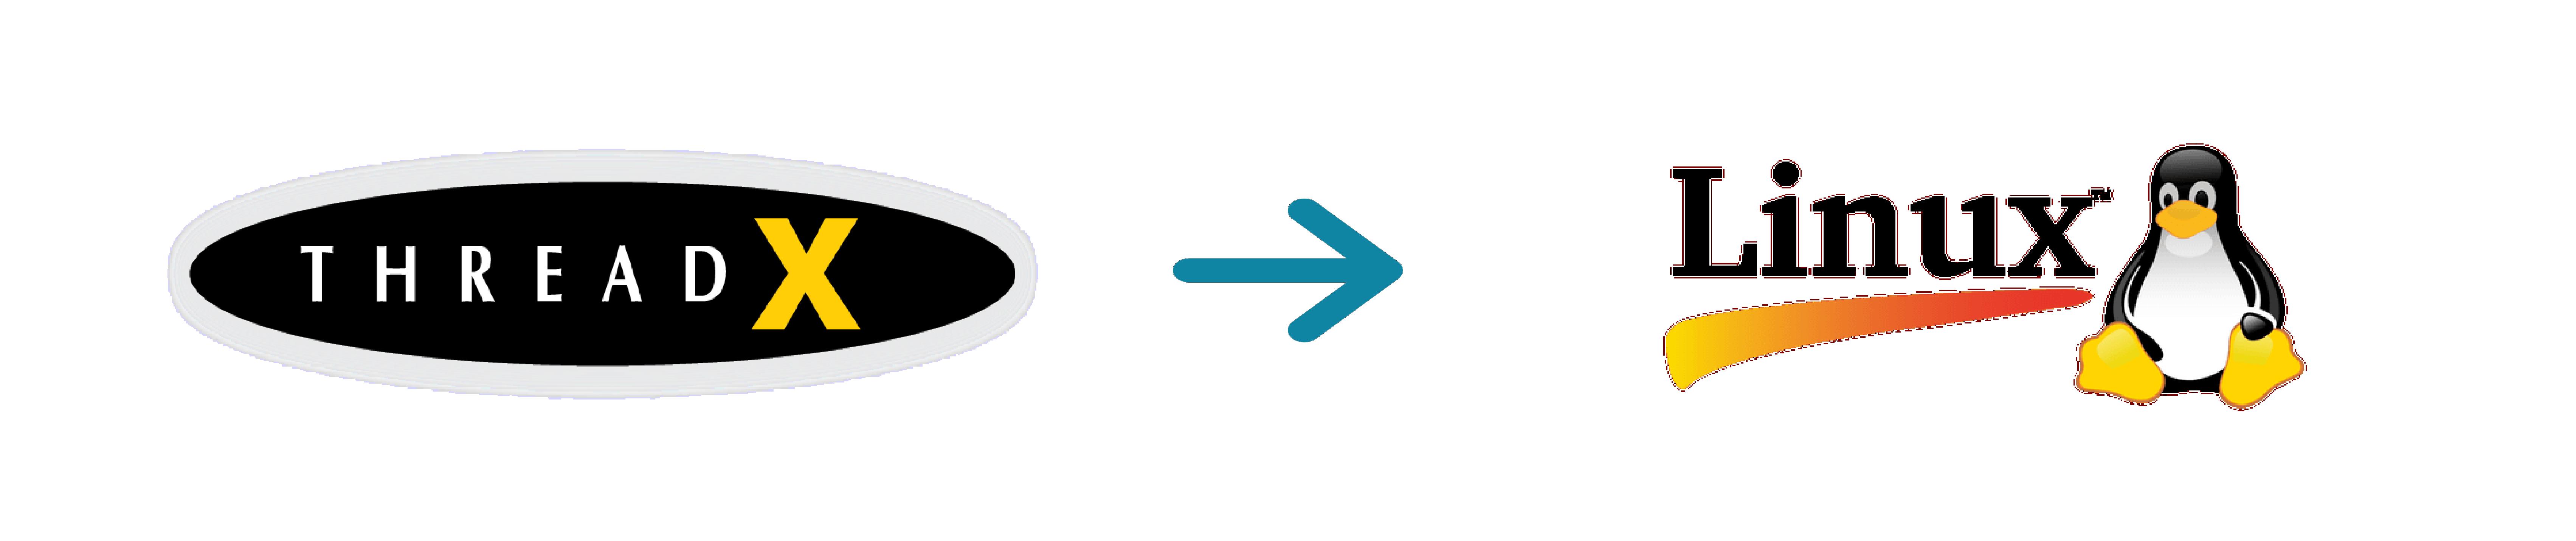 ThreadX To Linux